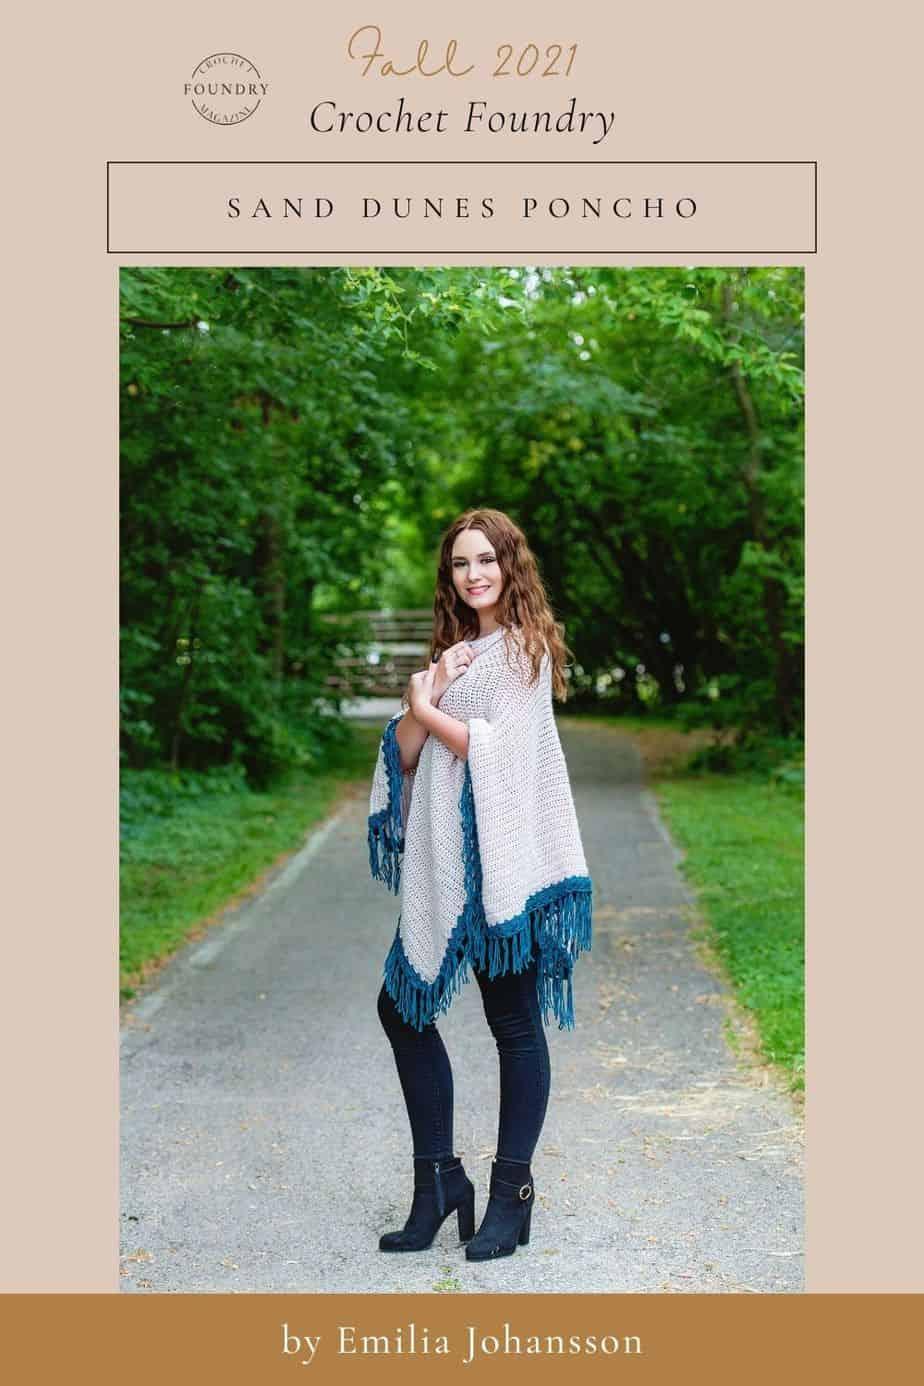 Sand Dunes Pocnho crochet pattern for Crochet Foundry Magazine 2021 by Emilia Johansson